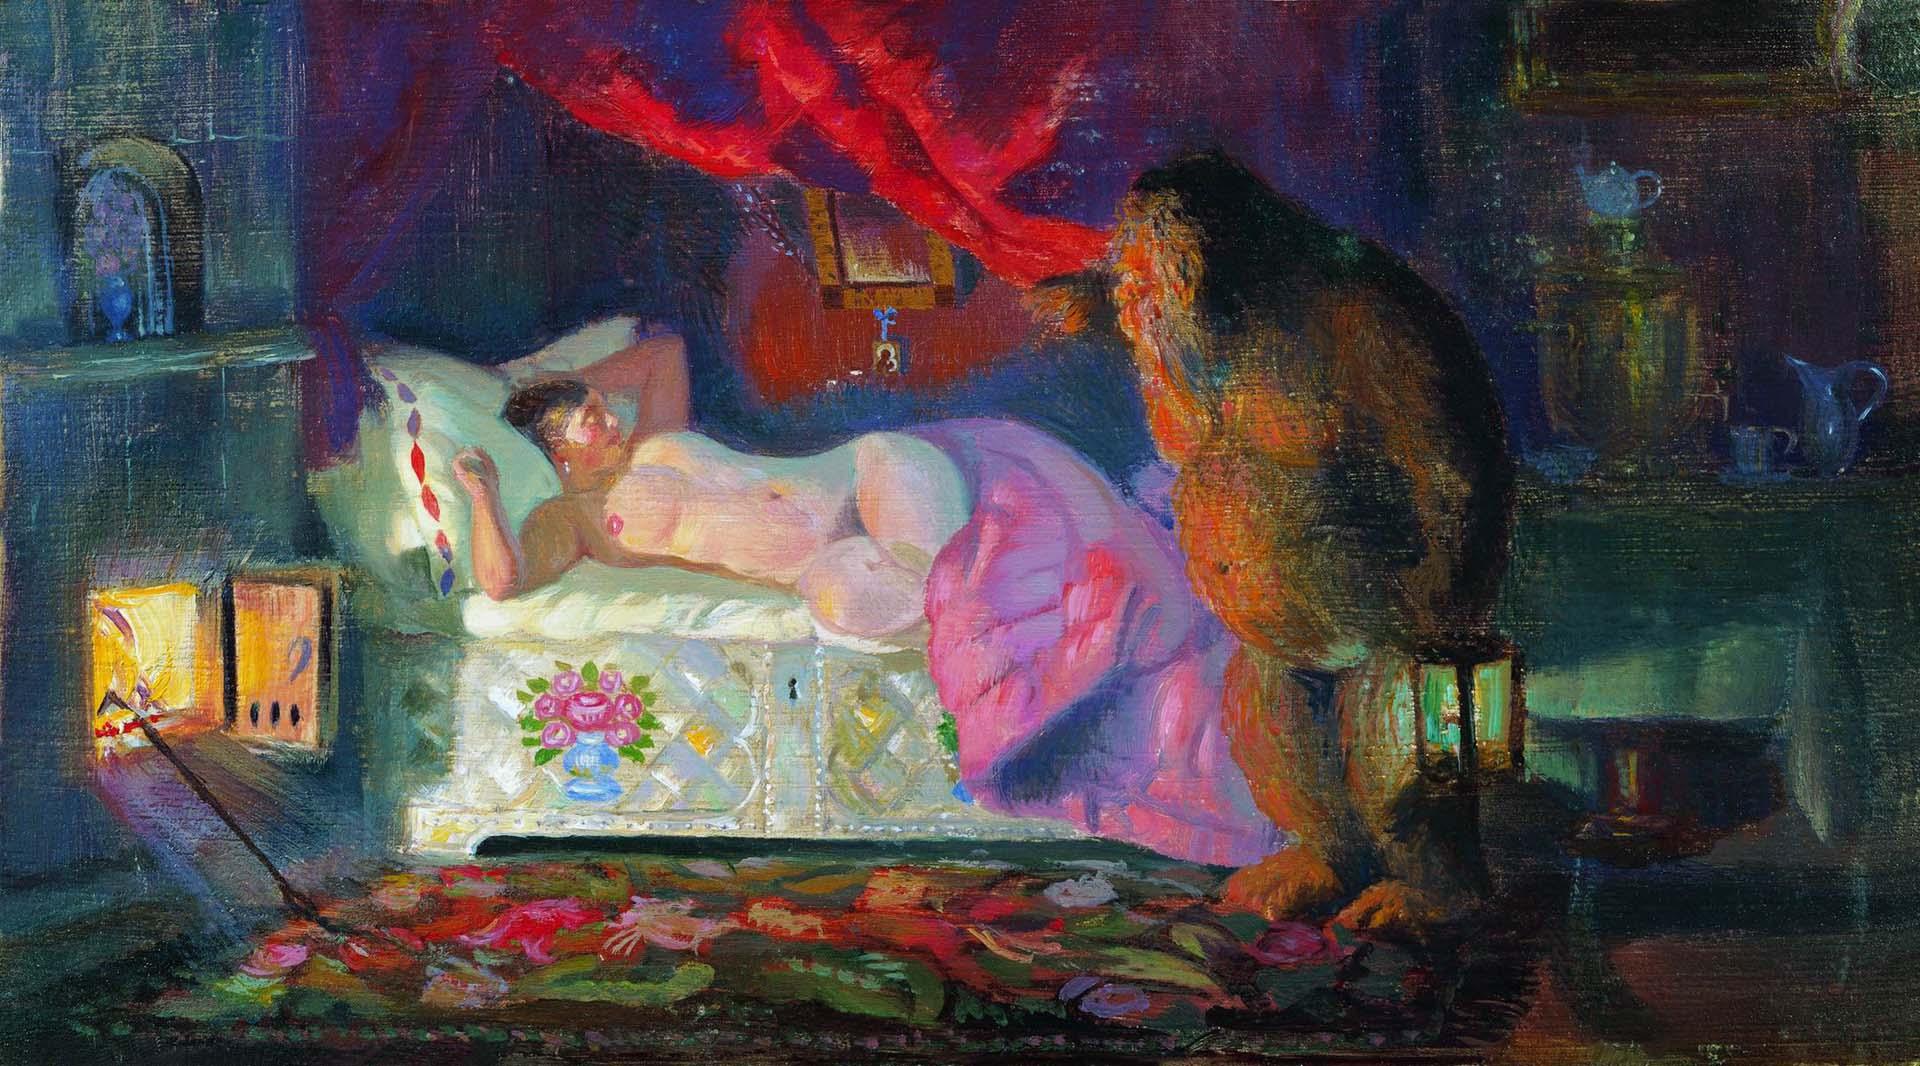 Борис Кустодиев (Boris Kustodiev), Купчиха и домовой